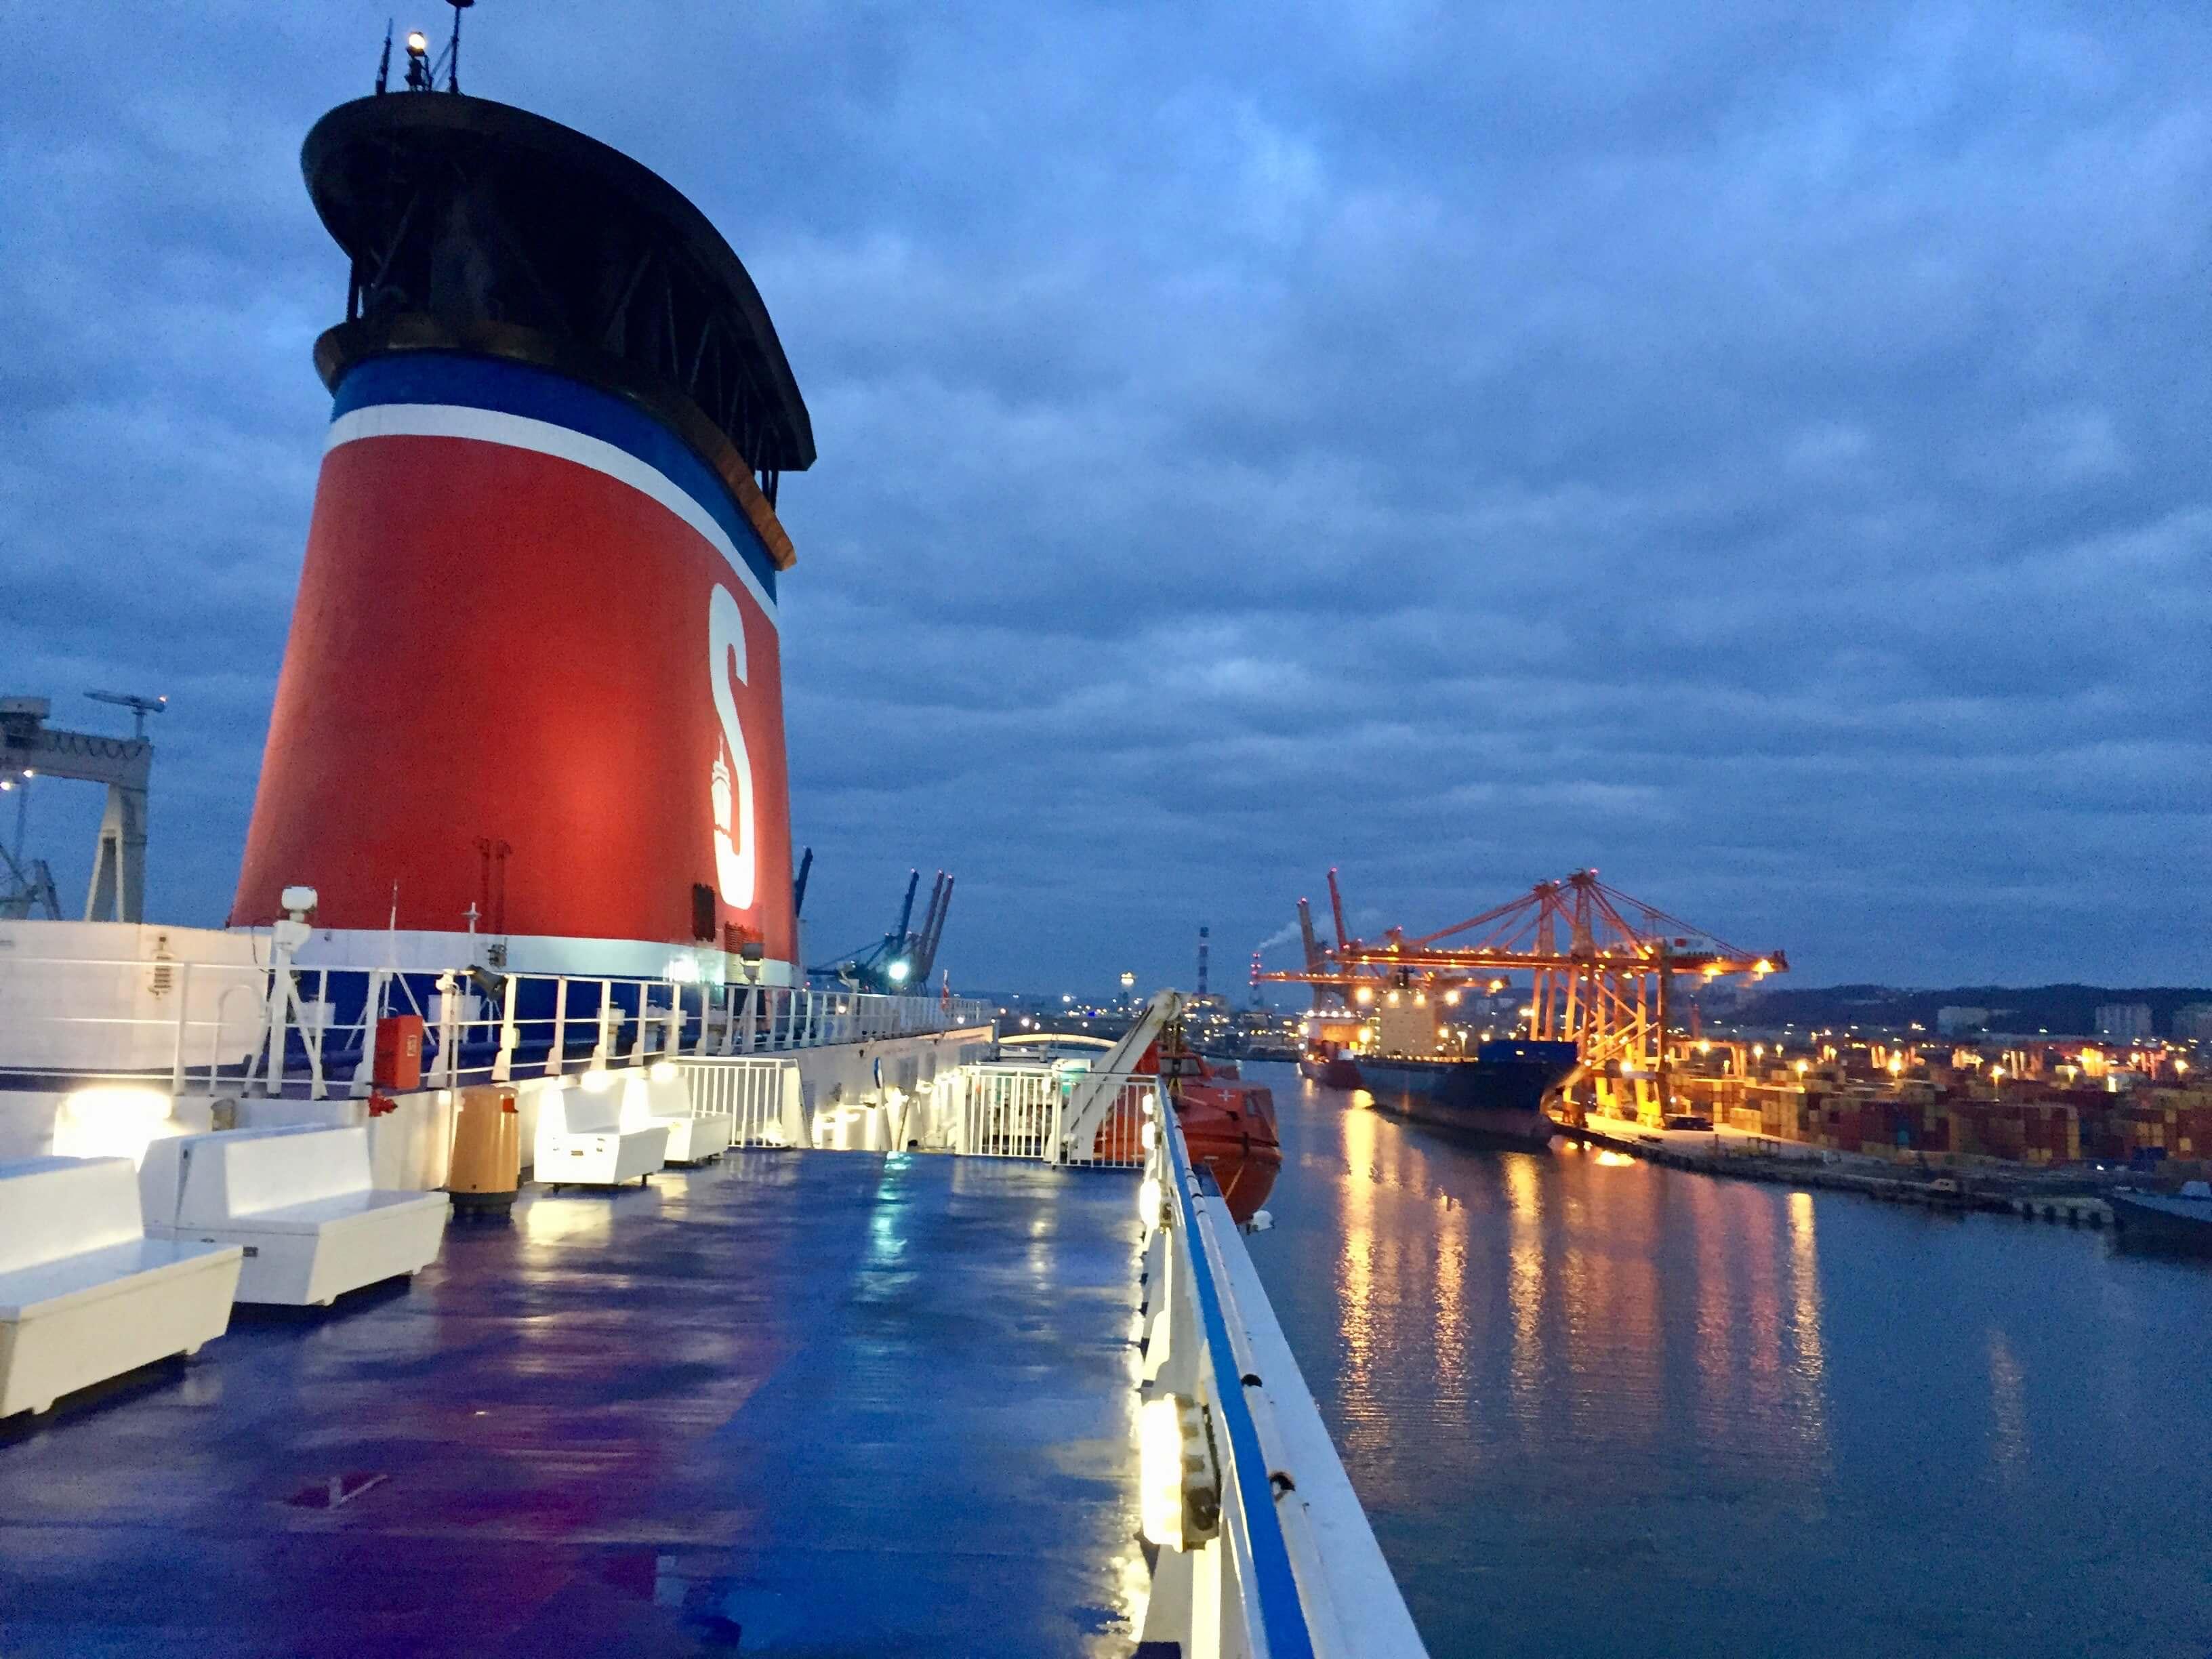 Sweden, Karlskrona - Stena Line ferry